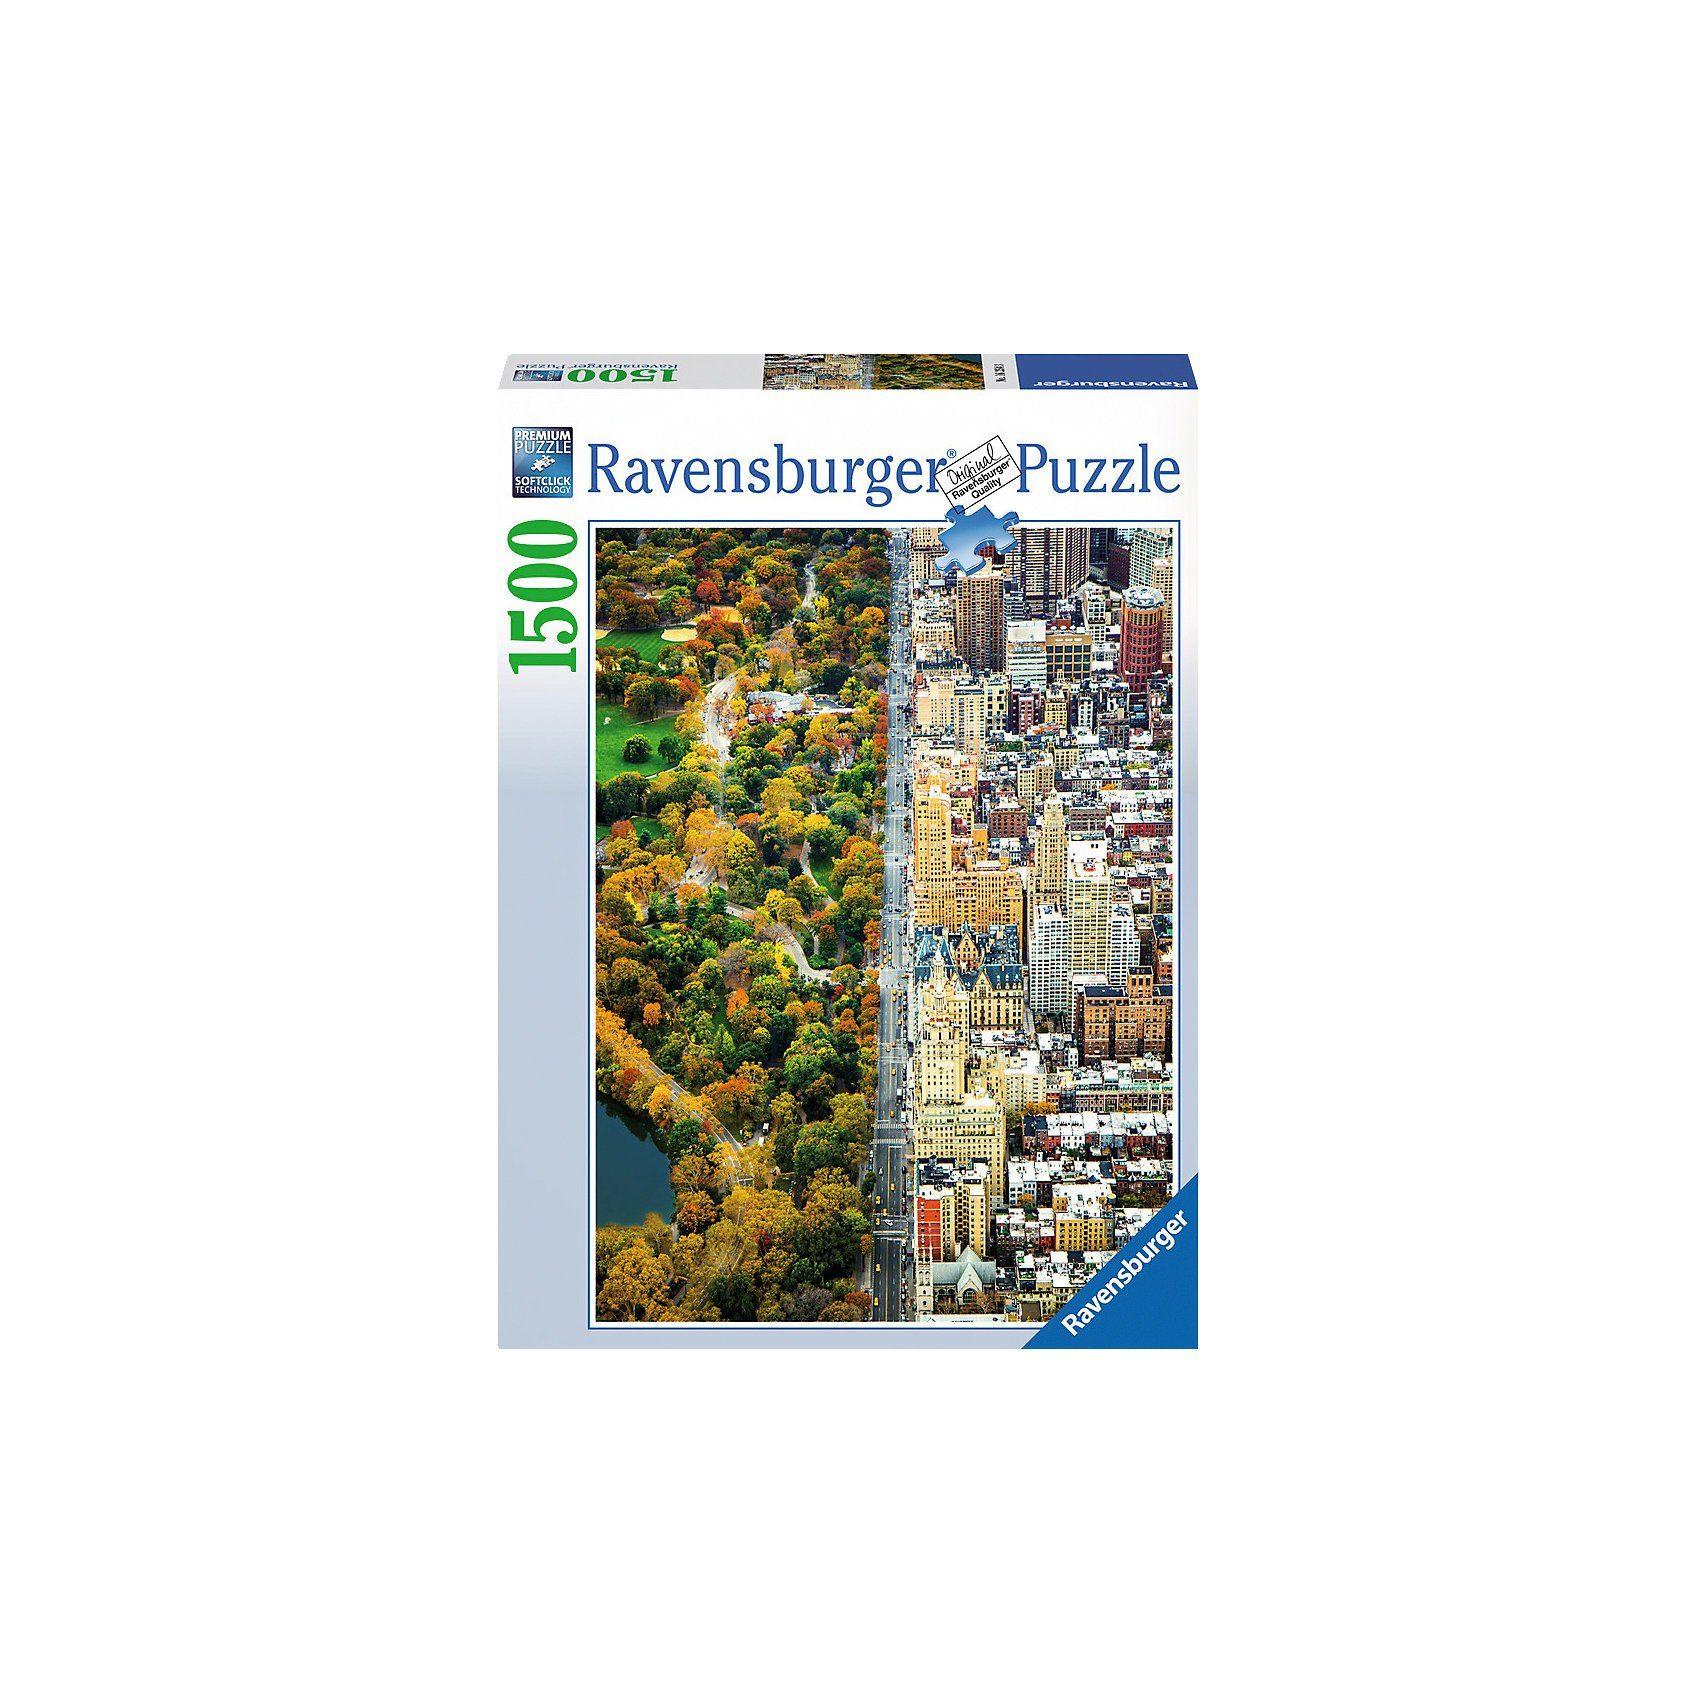 Ravensburger Puzzle 1500 Teile Geteilte Stadt